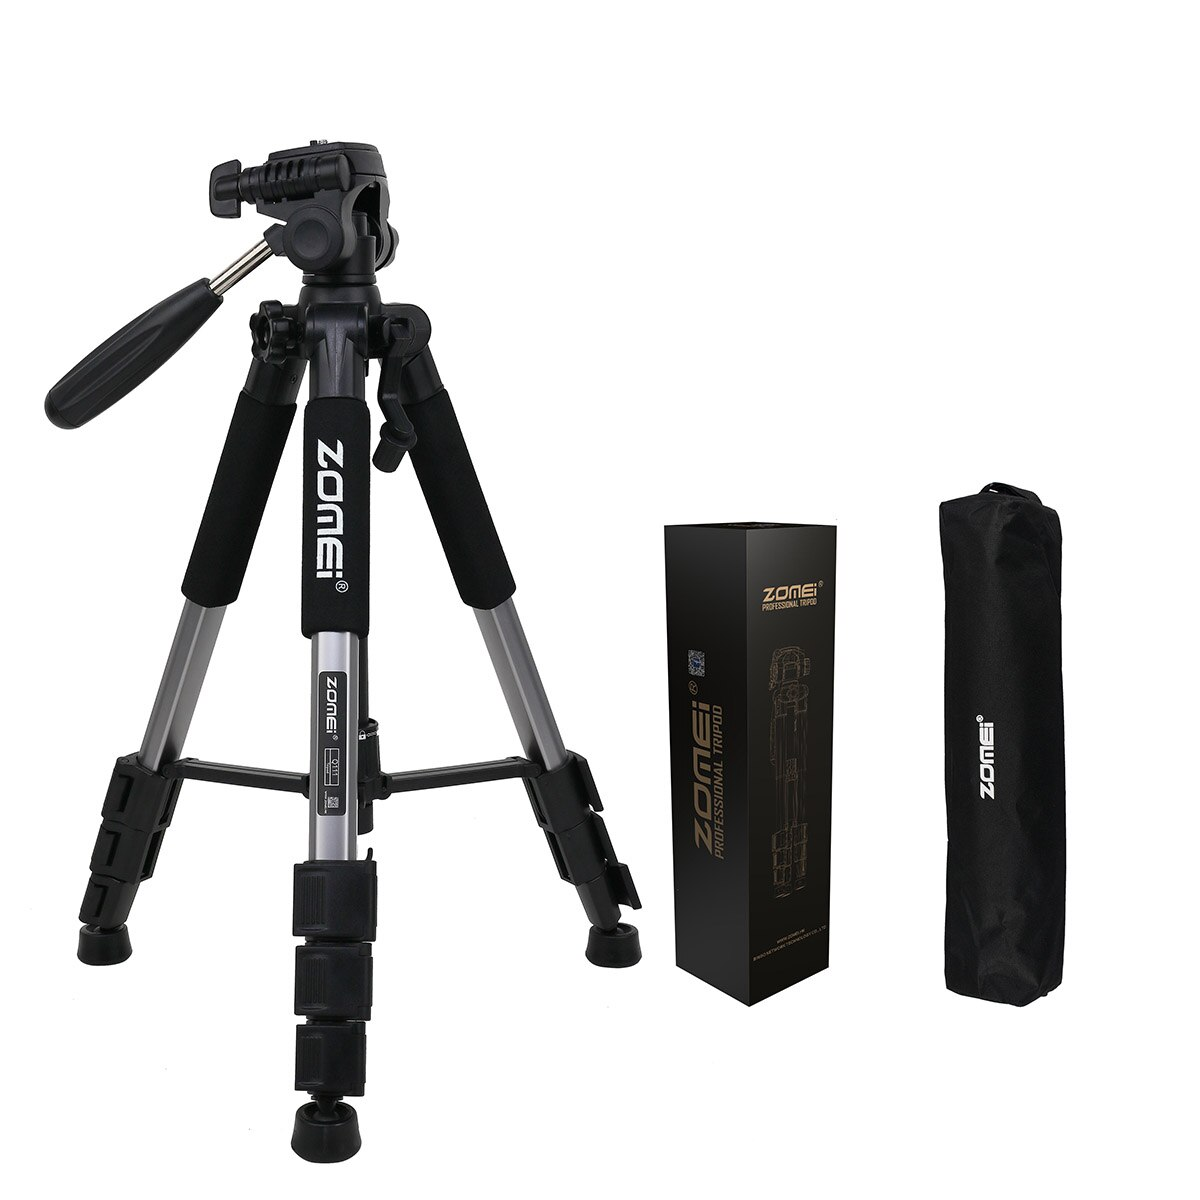 ZOMEI Q111, Trípode de cámara de aluminio de viaje portátil profesional de alta calidad y cabezal Pan para cámara Digital SLR DSLR en tres colores